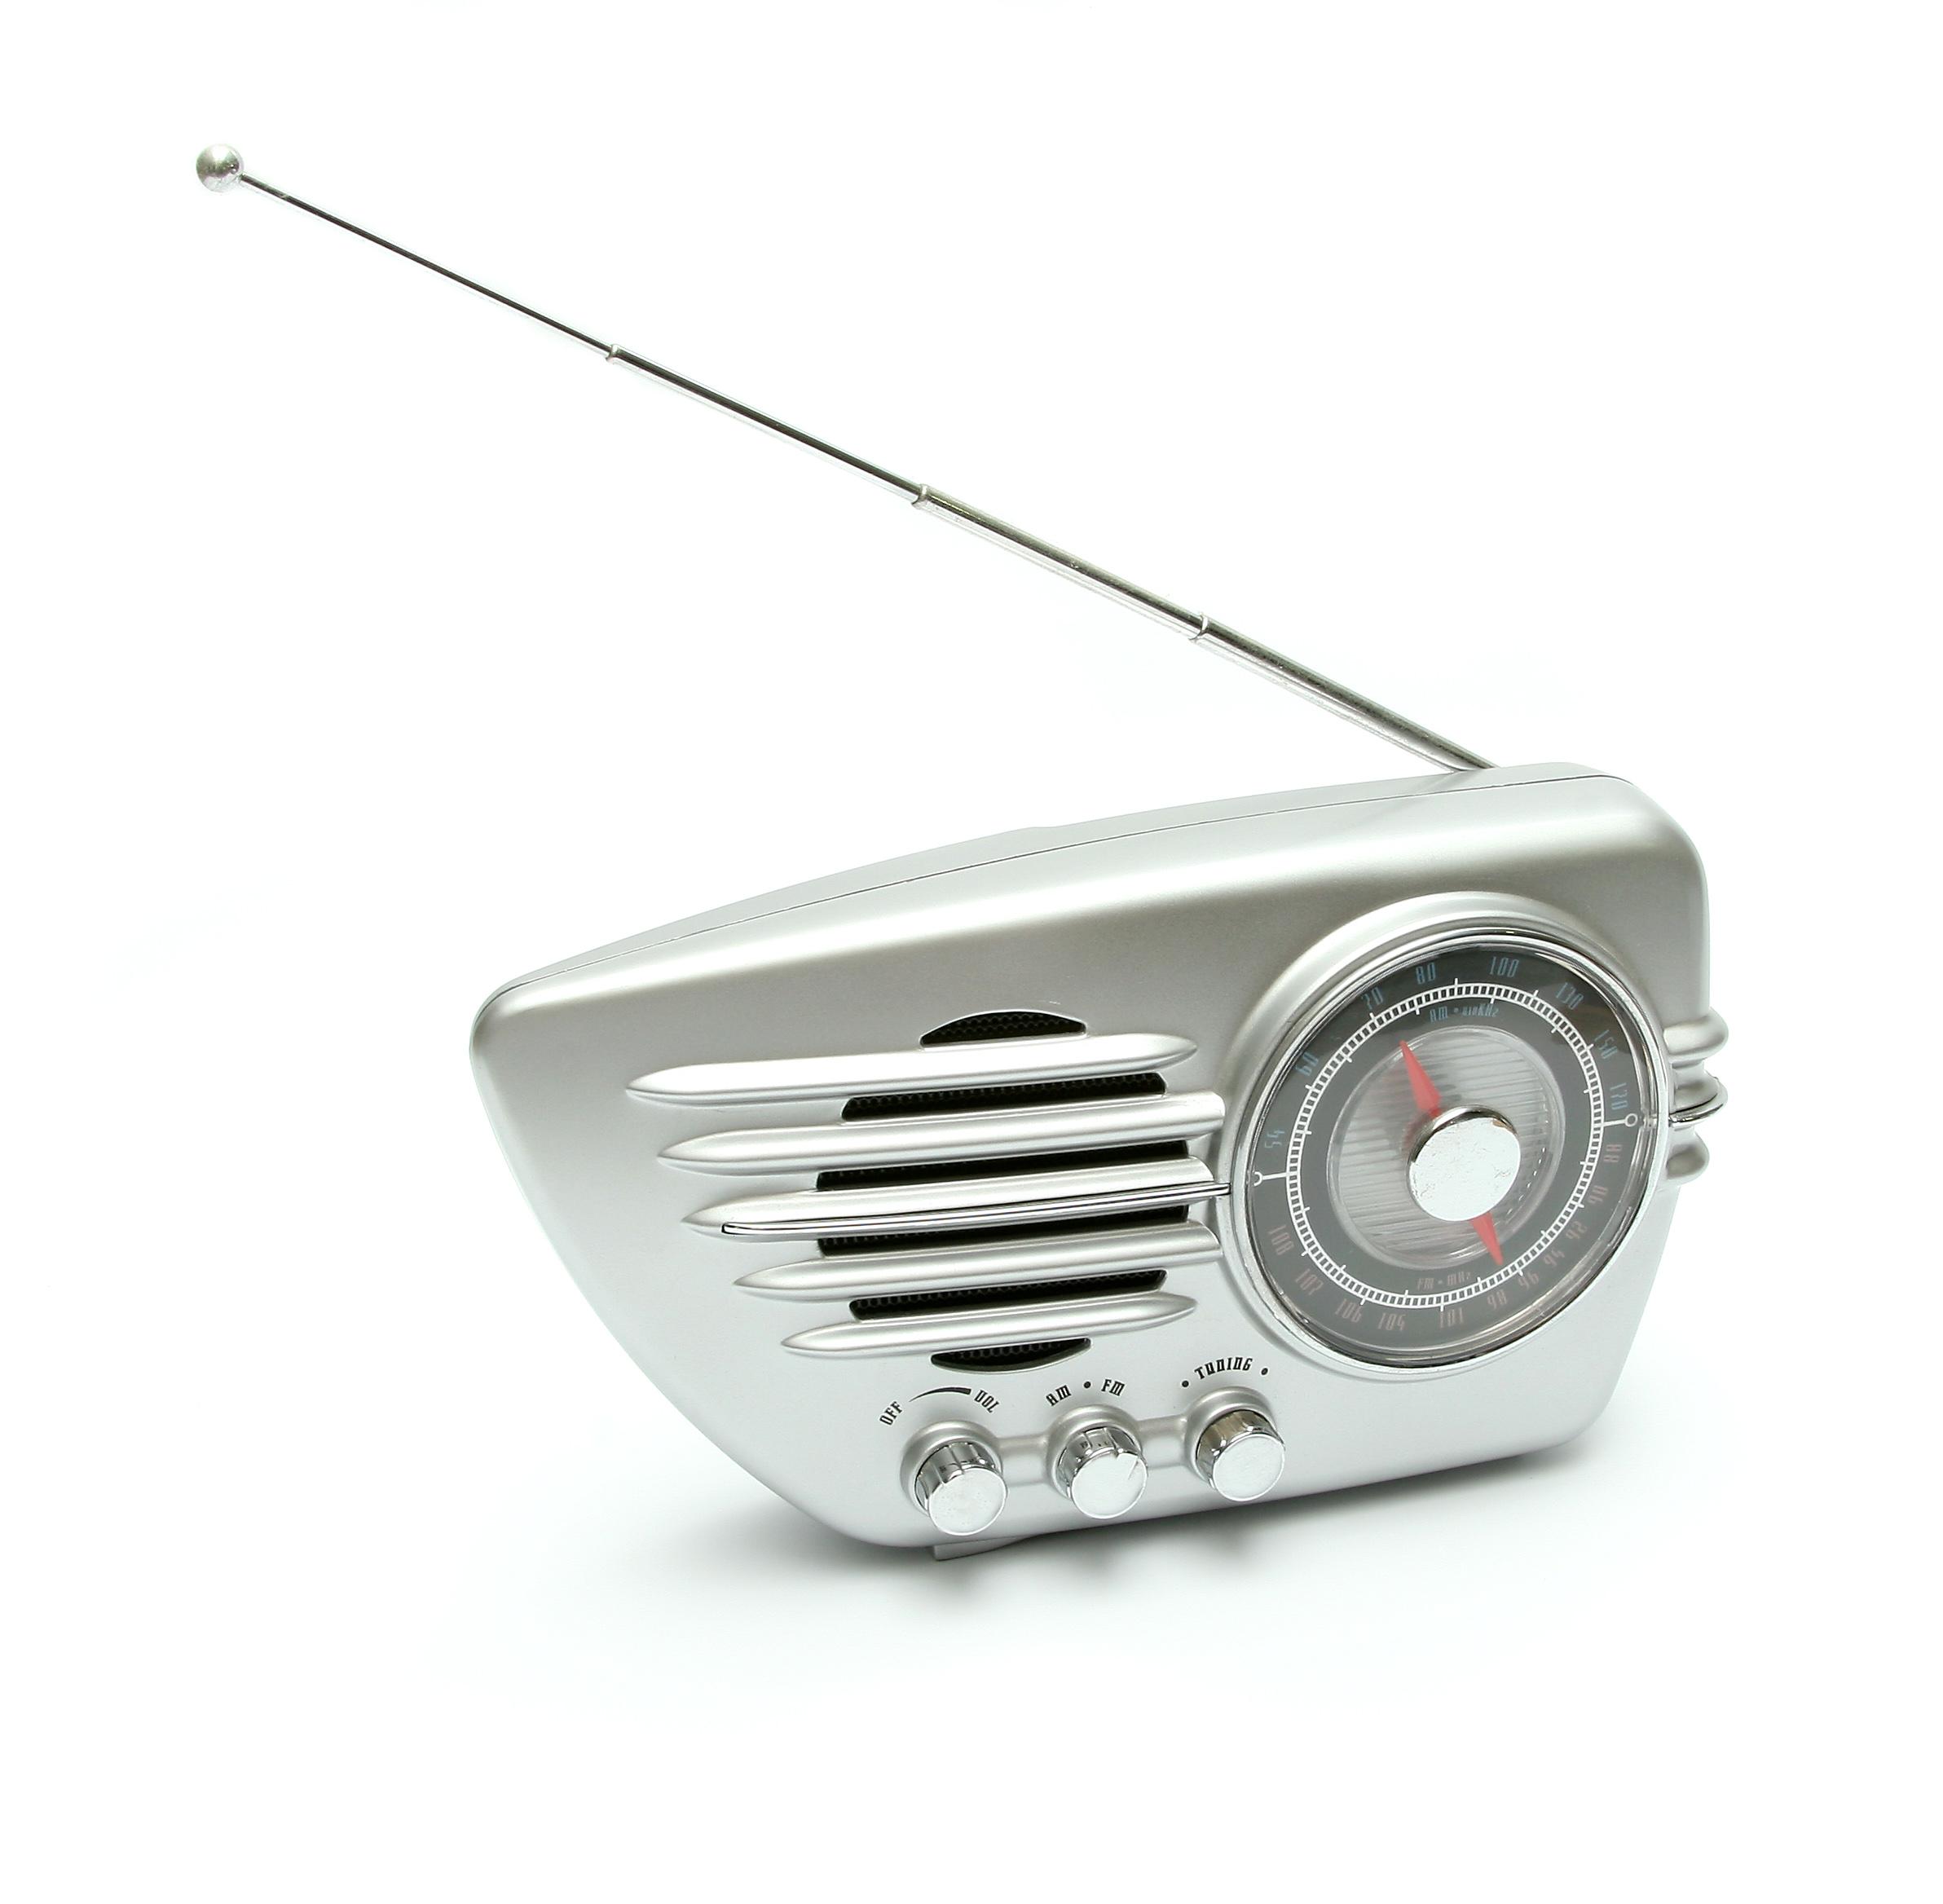 Старое радио - радиопостановки, радиоспектакли, сказки ...